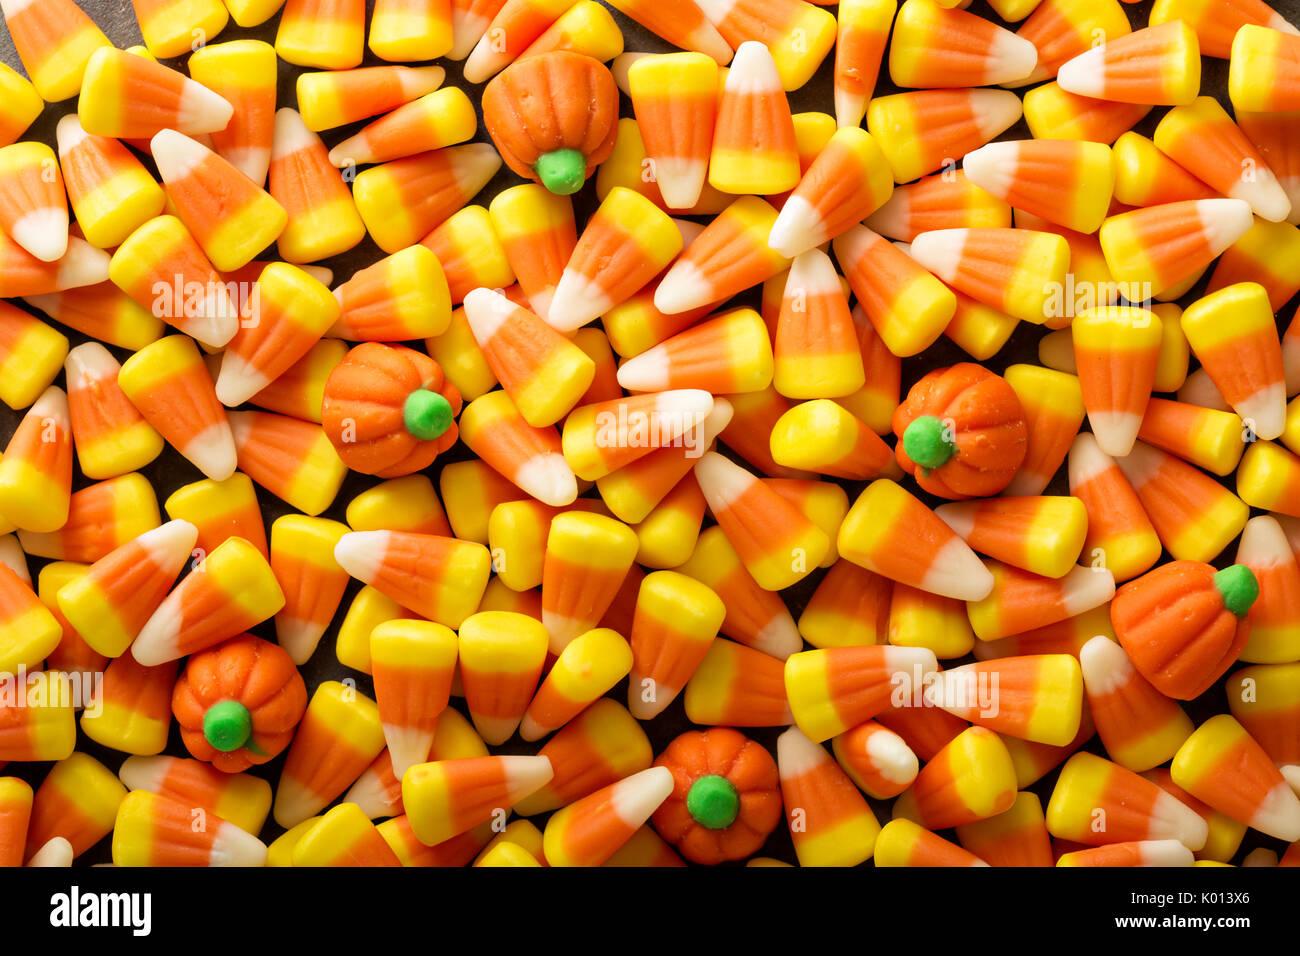 how to make corn stocks for halloween